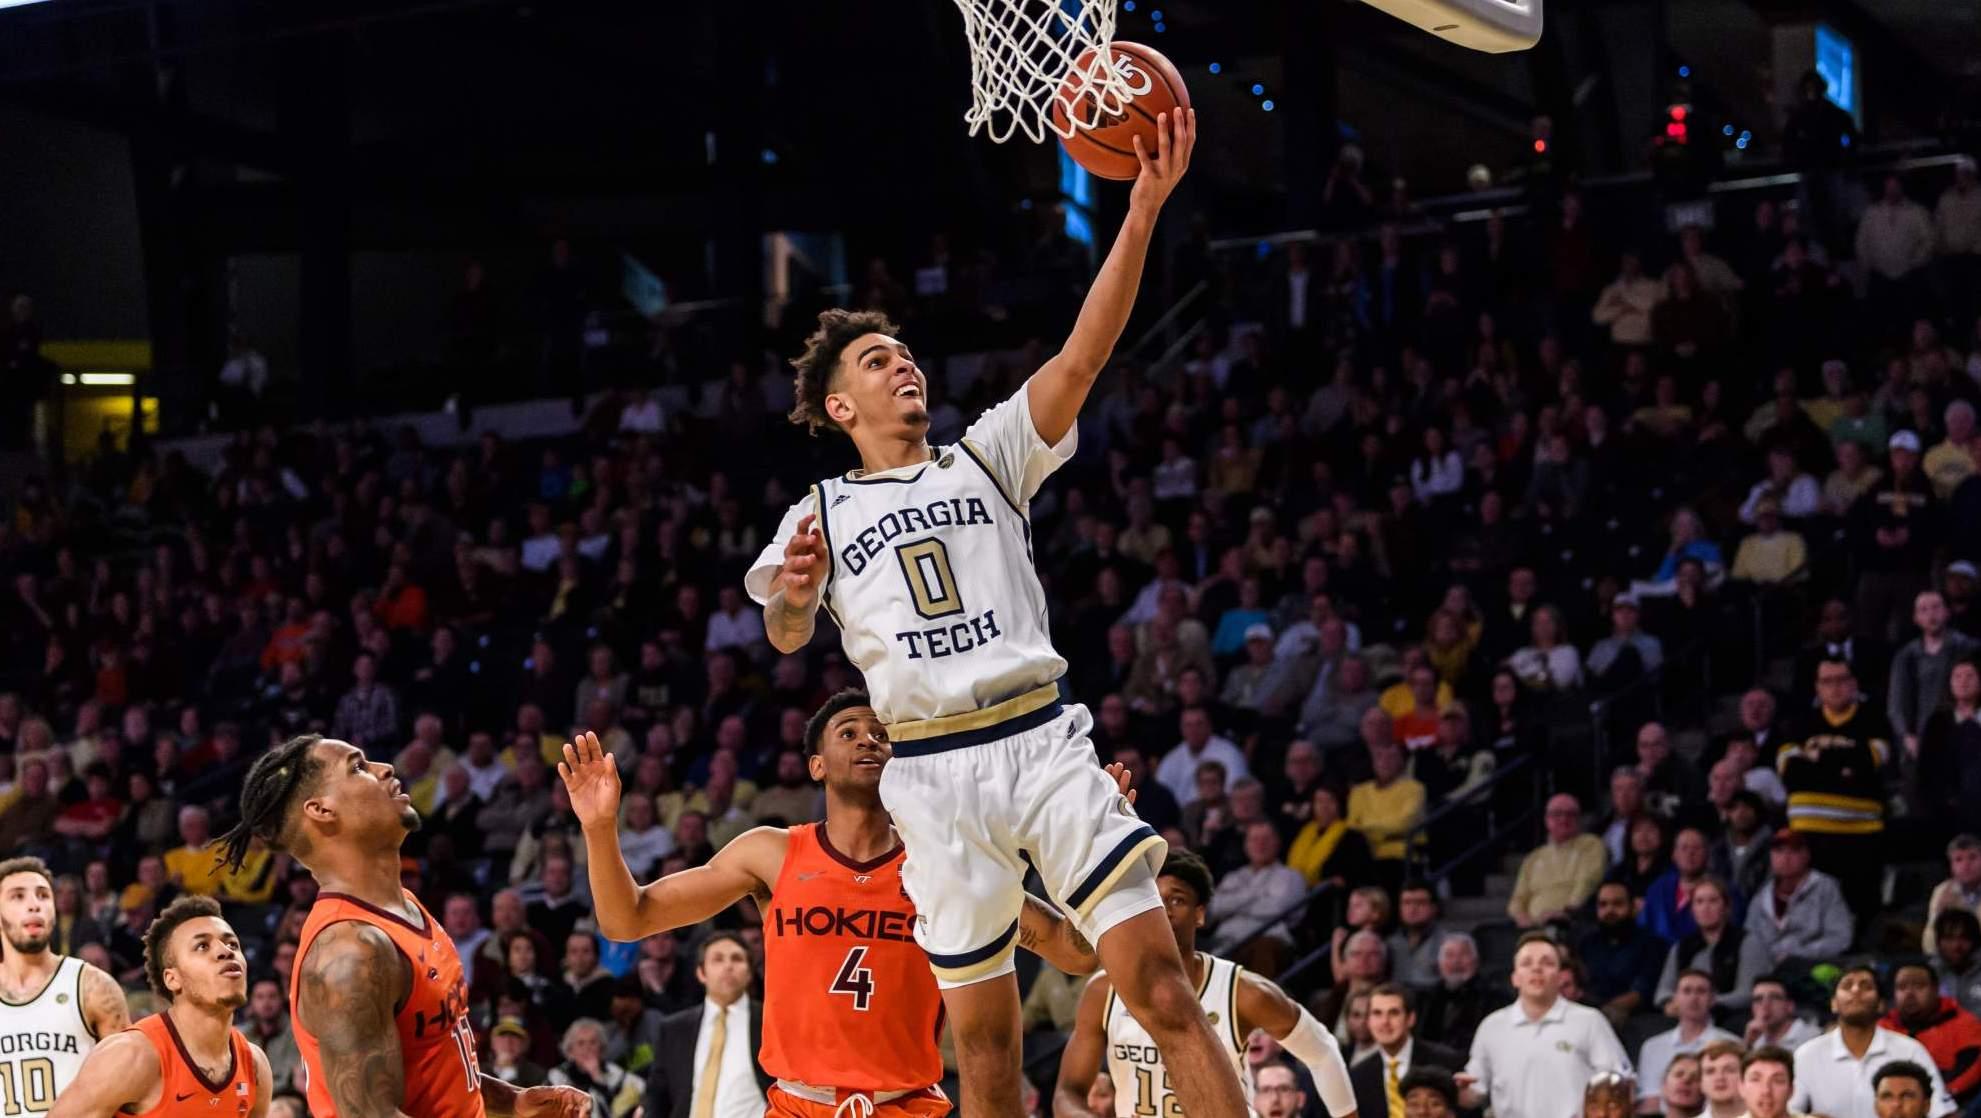 Georgia Tech Travels to Face Syracuse – Men's Basketball